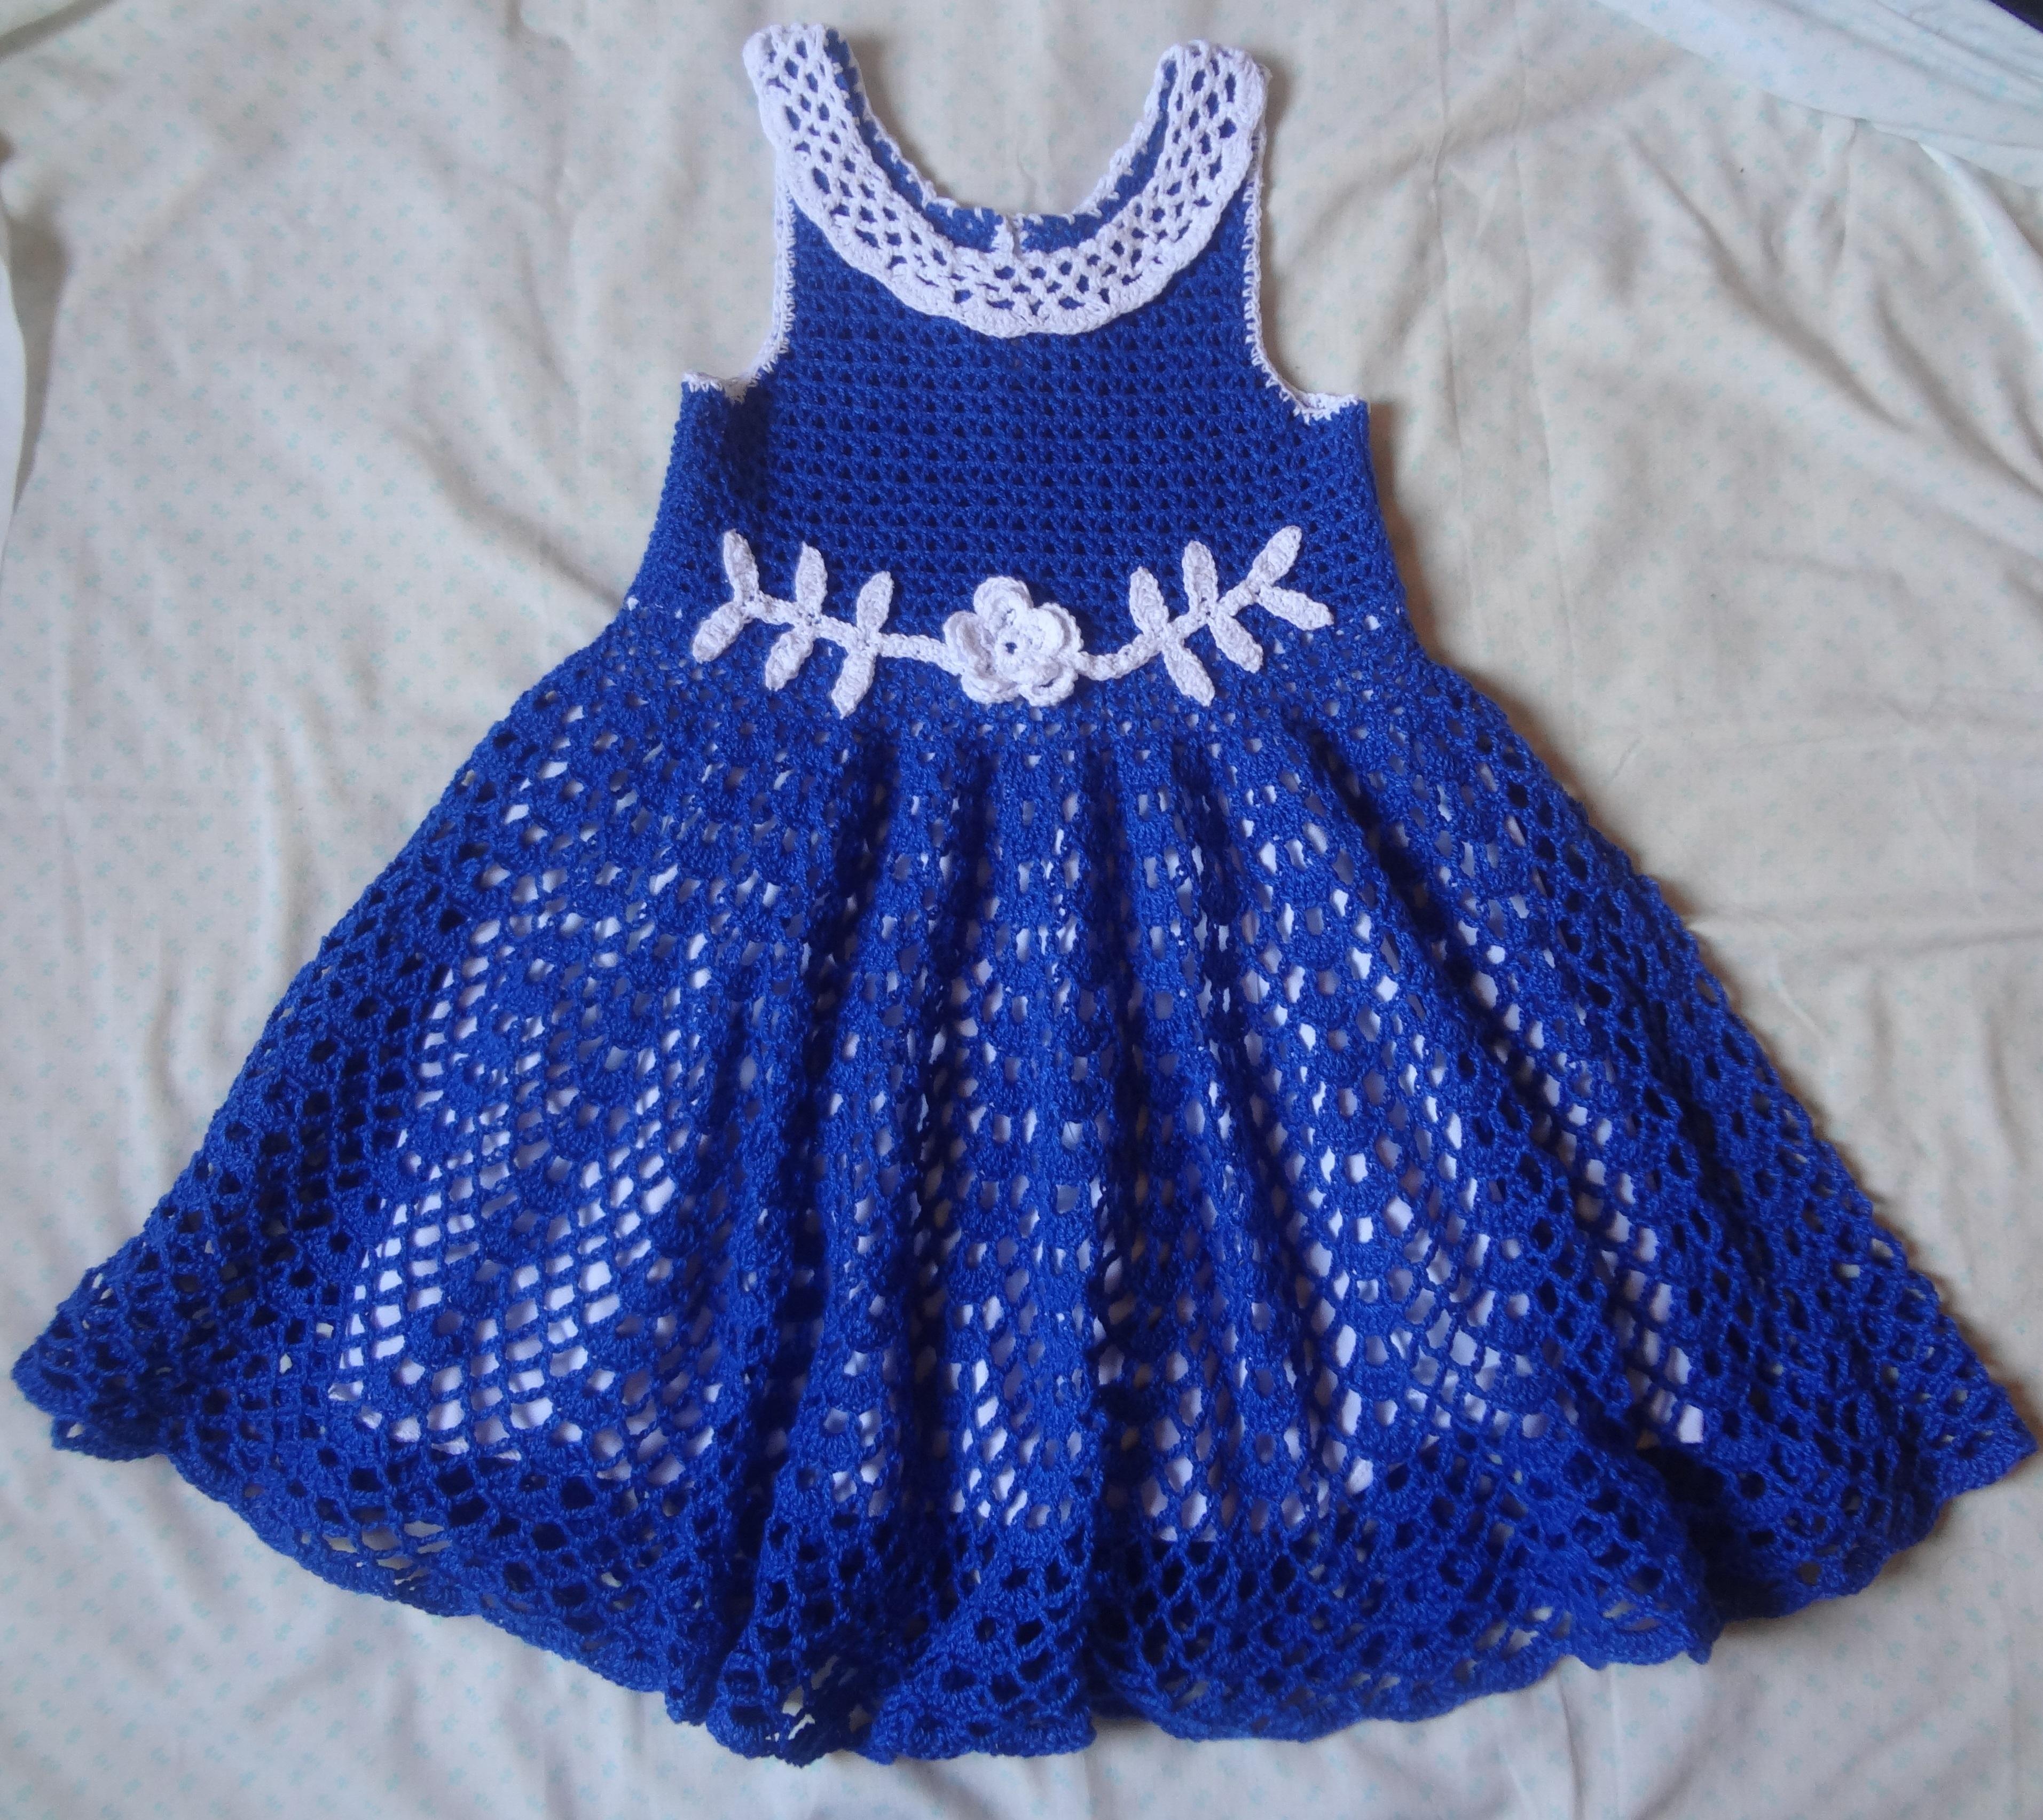 Preferência Vestido crochê infantil no Elo7 | Artess da Bia (83C53A) ZD01